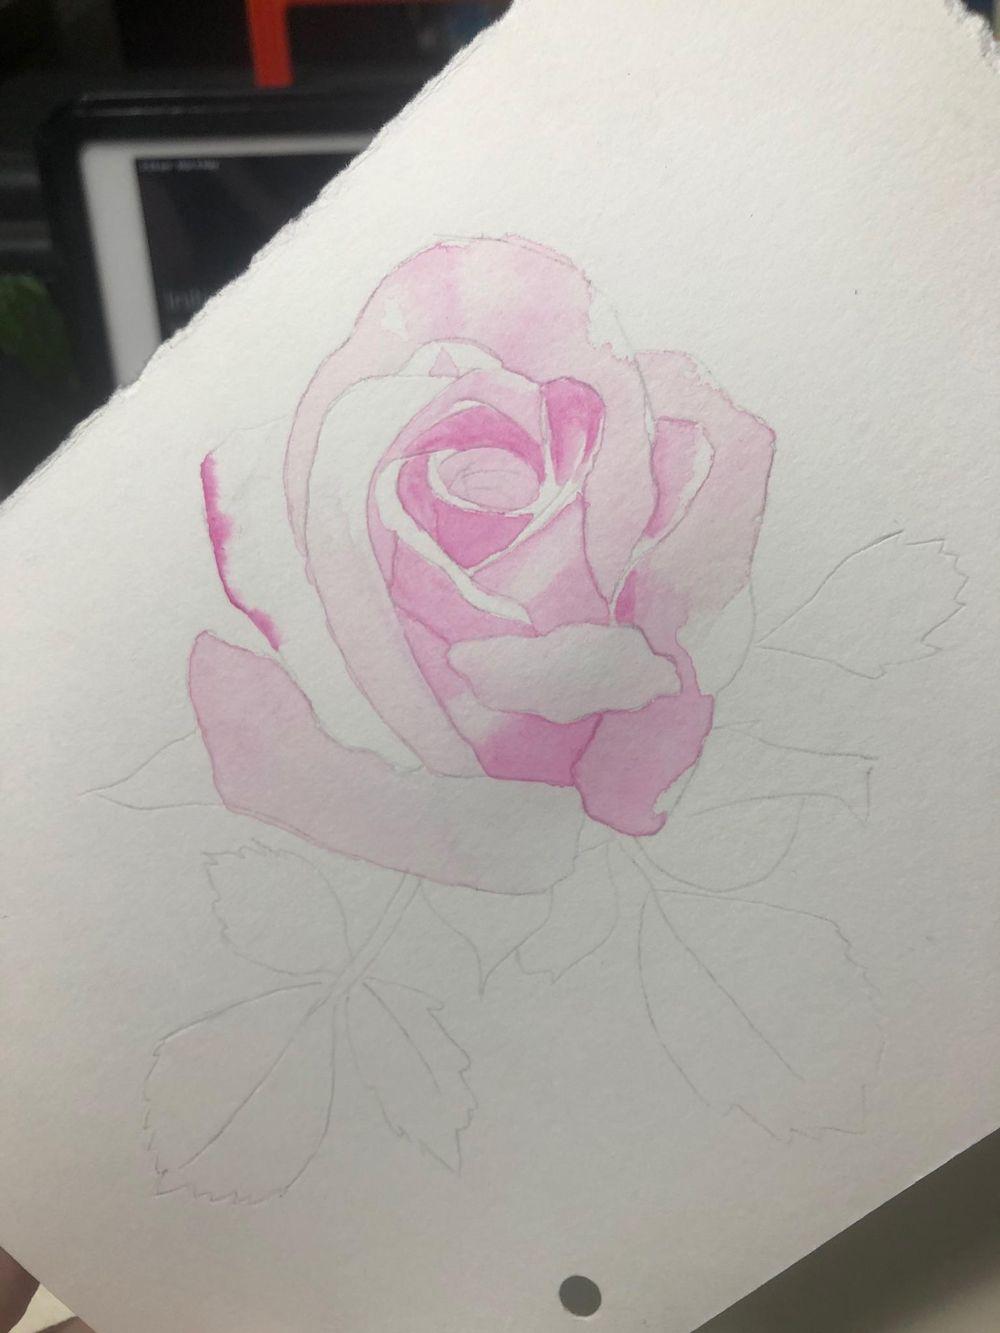 Opera rose - image 3 - student project